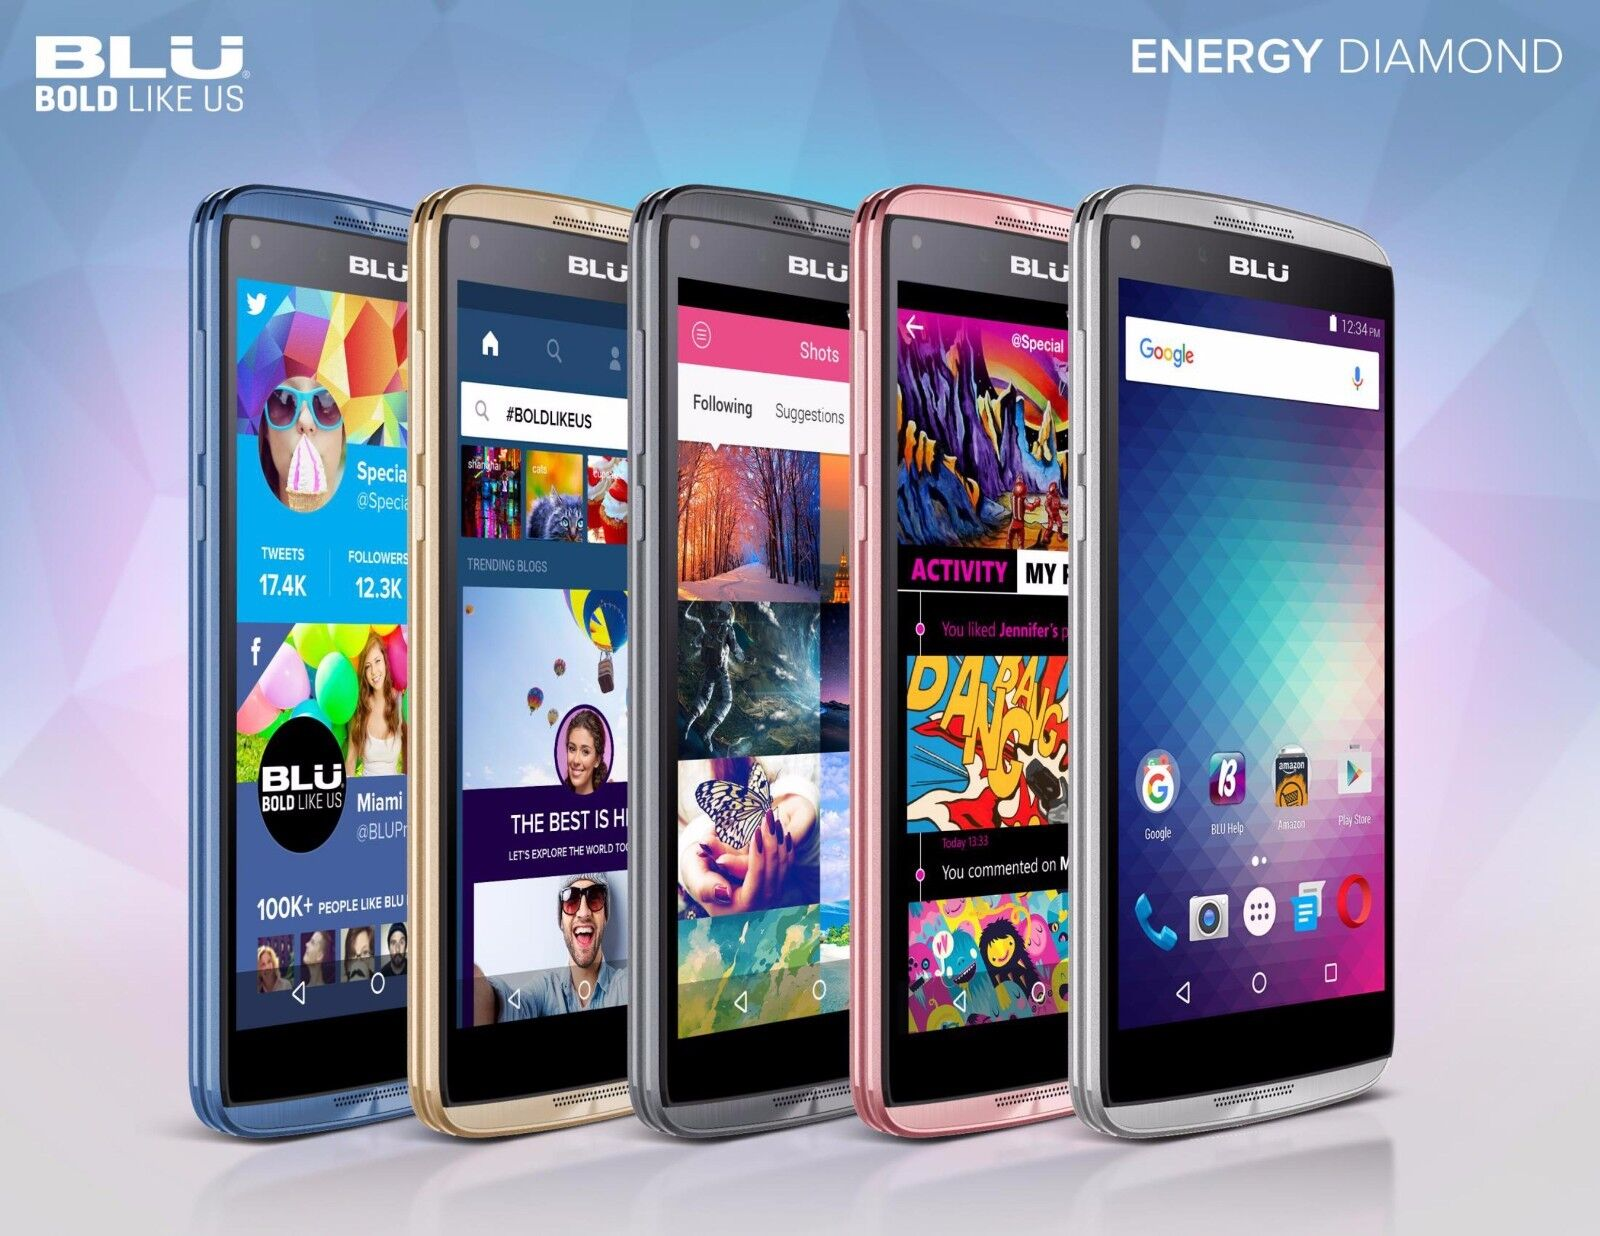 $48.97 - Unlocked Android smartphone  GSM Dual Sim  Cell Phone -BLU Energy Diamond Mini